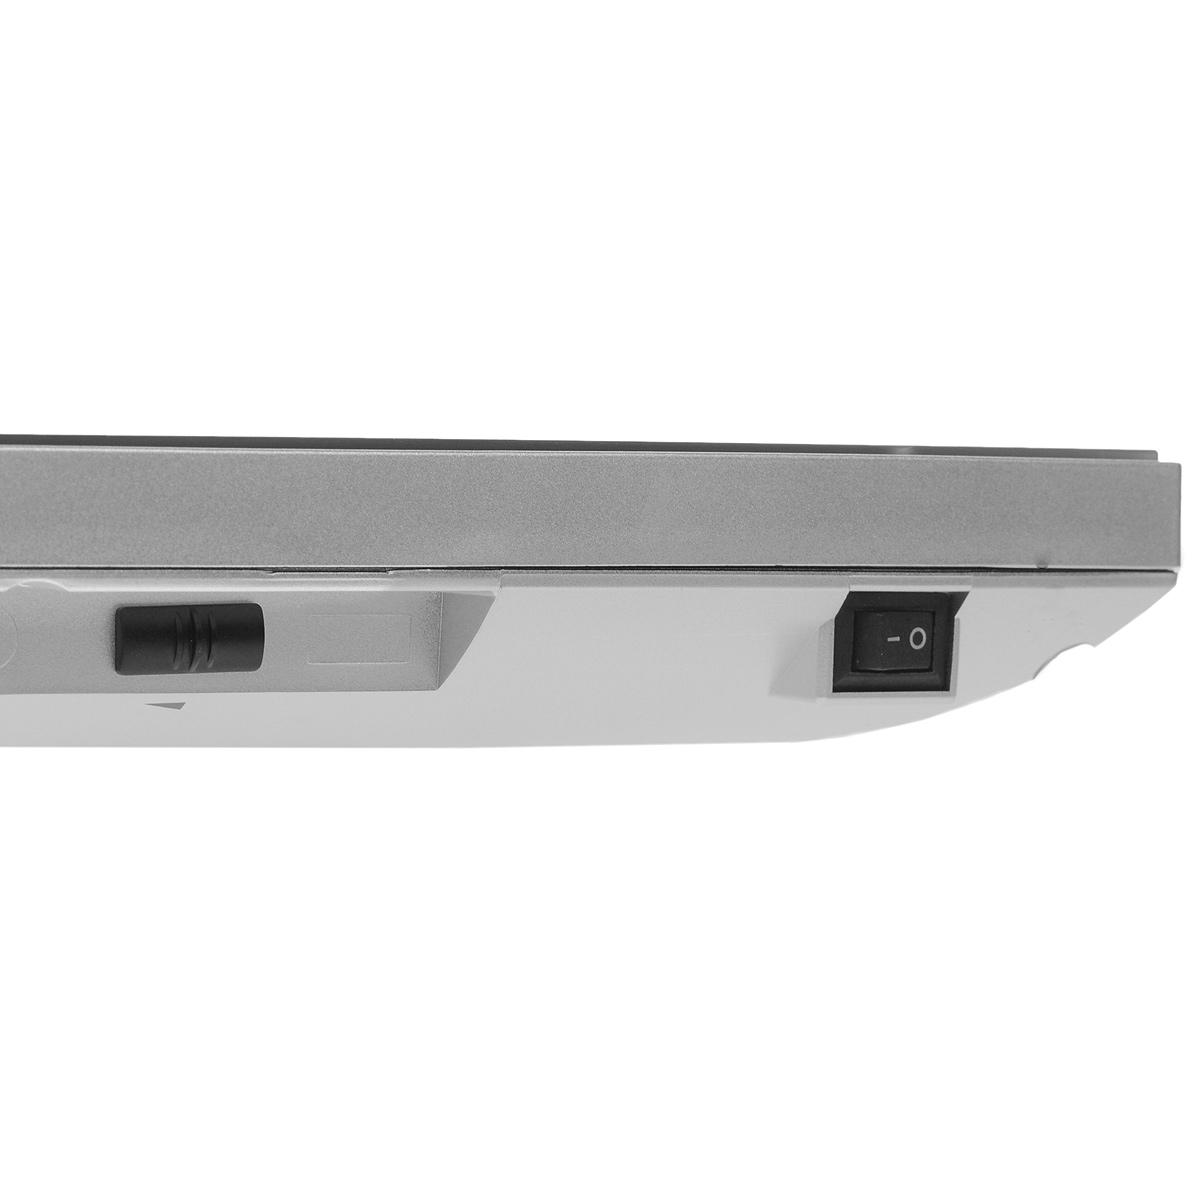 Falcon Eye FE-98ZM цветной видеодомофон ( FE-98ZM )